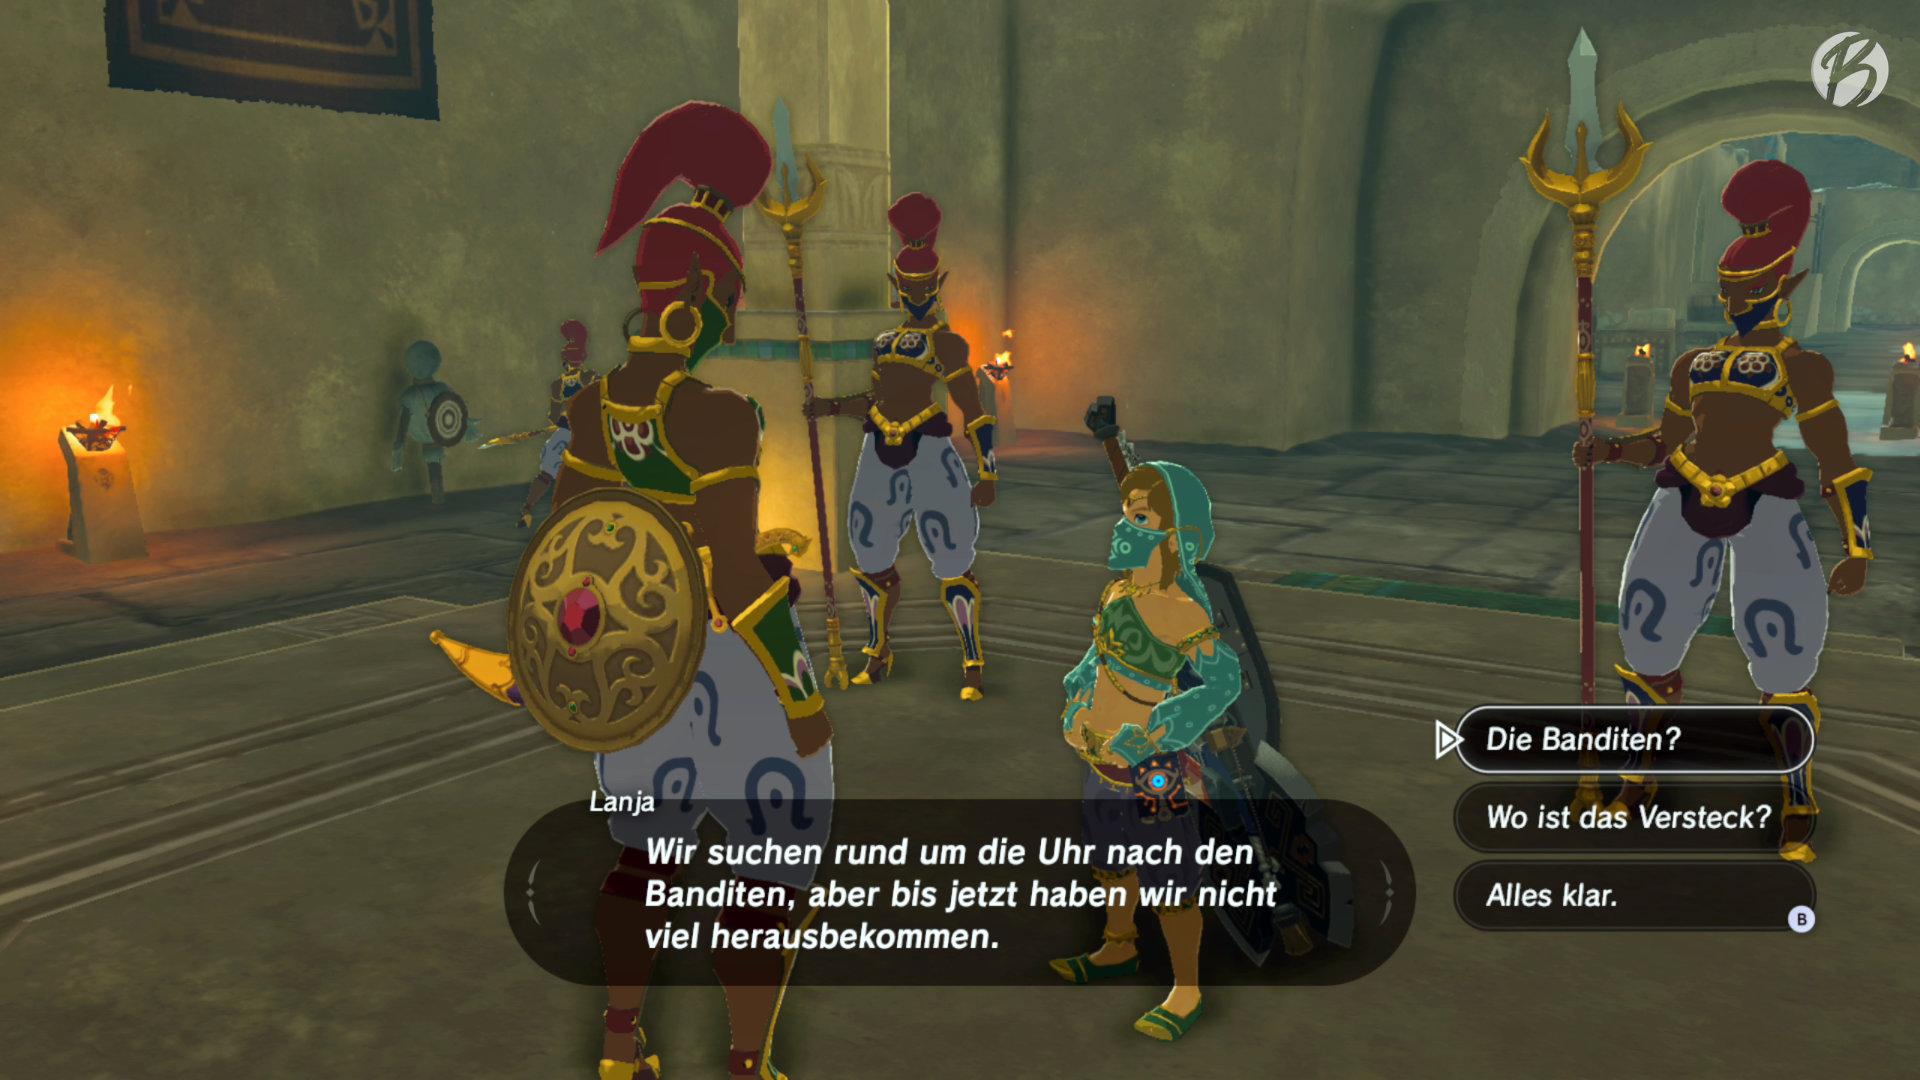 The Legend of Zelda: BotW - Ein seltener Anblick: Link als Frau verkleidet.